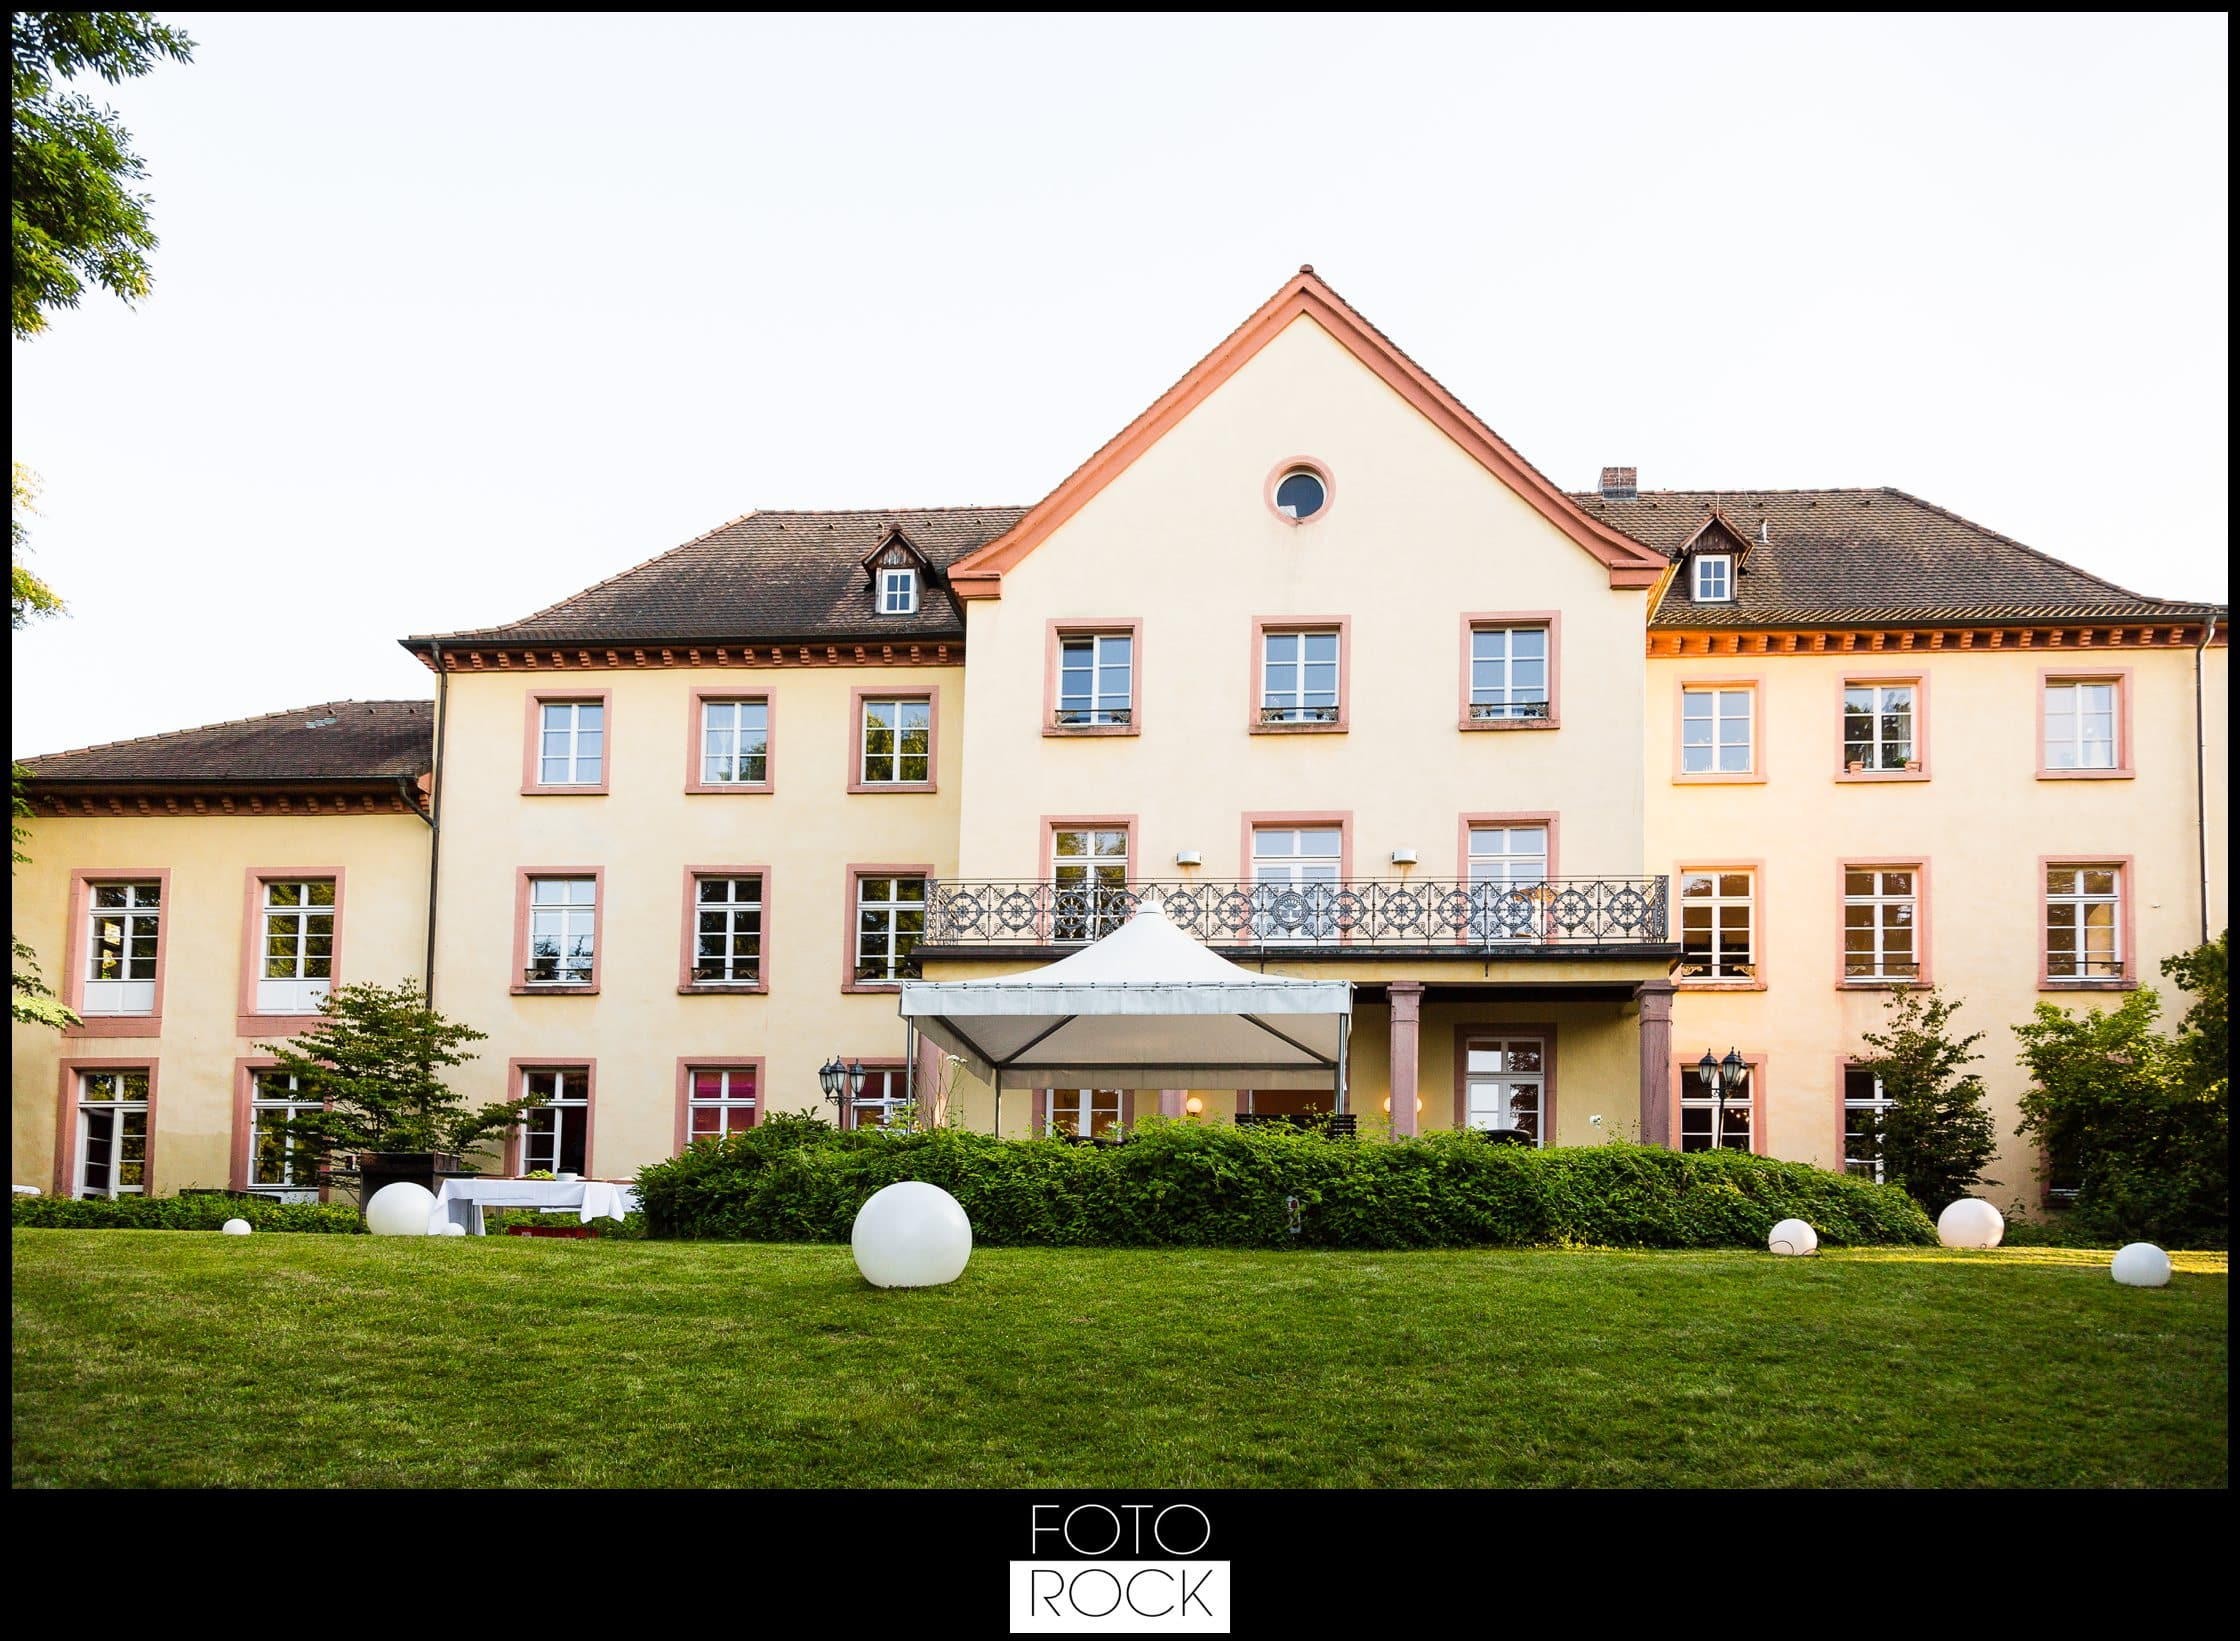 Hochzeit Jesuitenschloss Freiburg location lampen pavillon